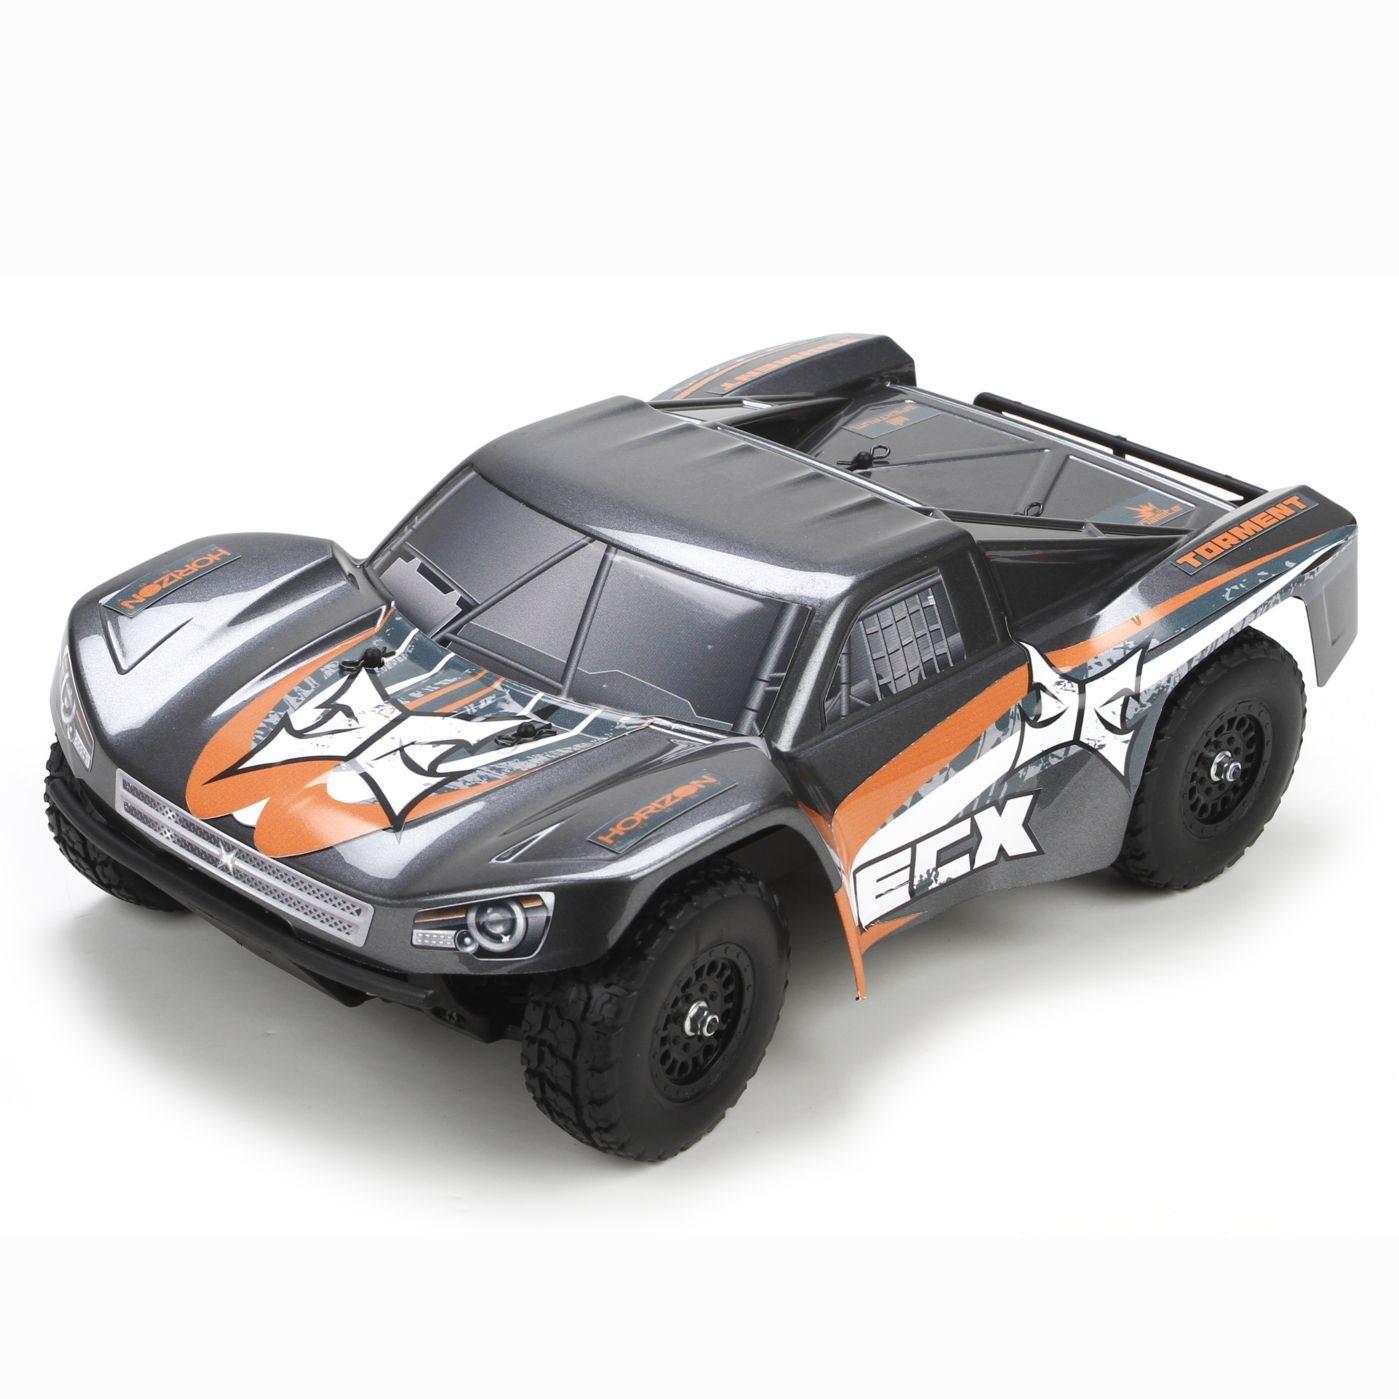 ECX Torment1/18 4WD Short Course Truck:Gray/OrangeRTR